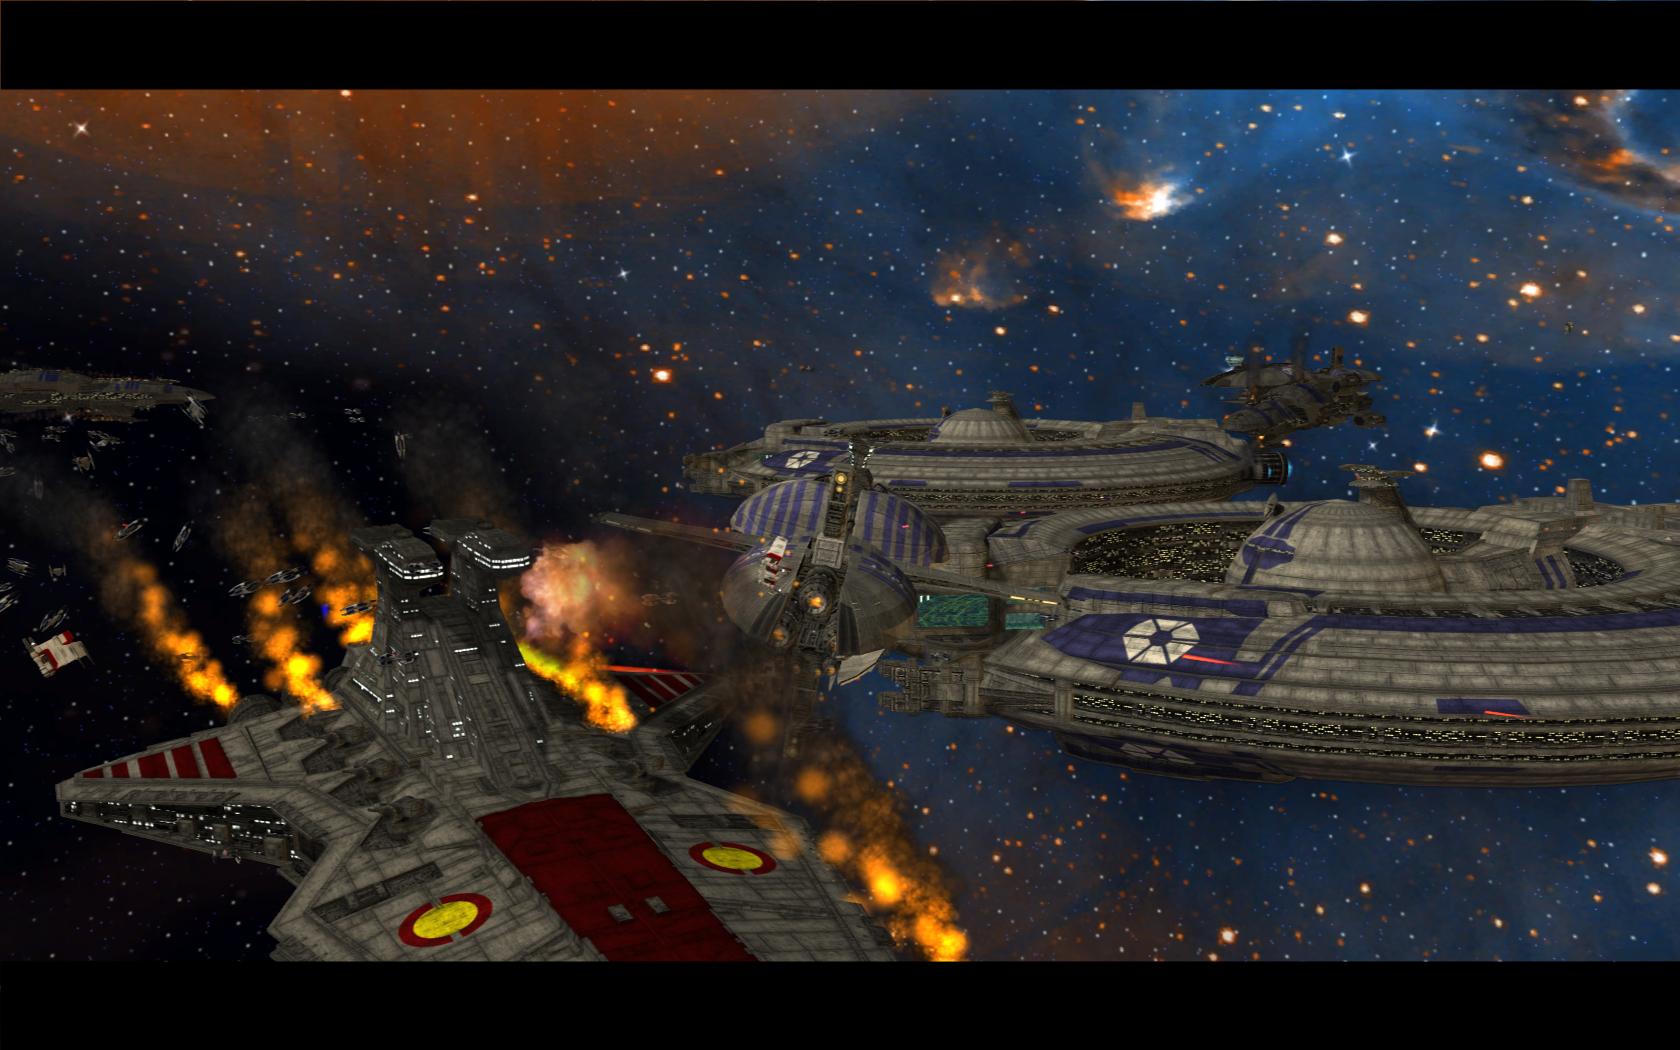 Star Wars Battlefront 2 2017 Space Battles Footage to